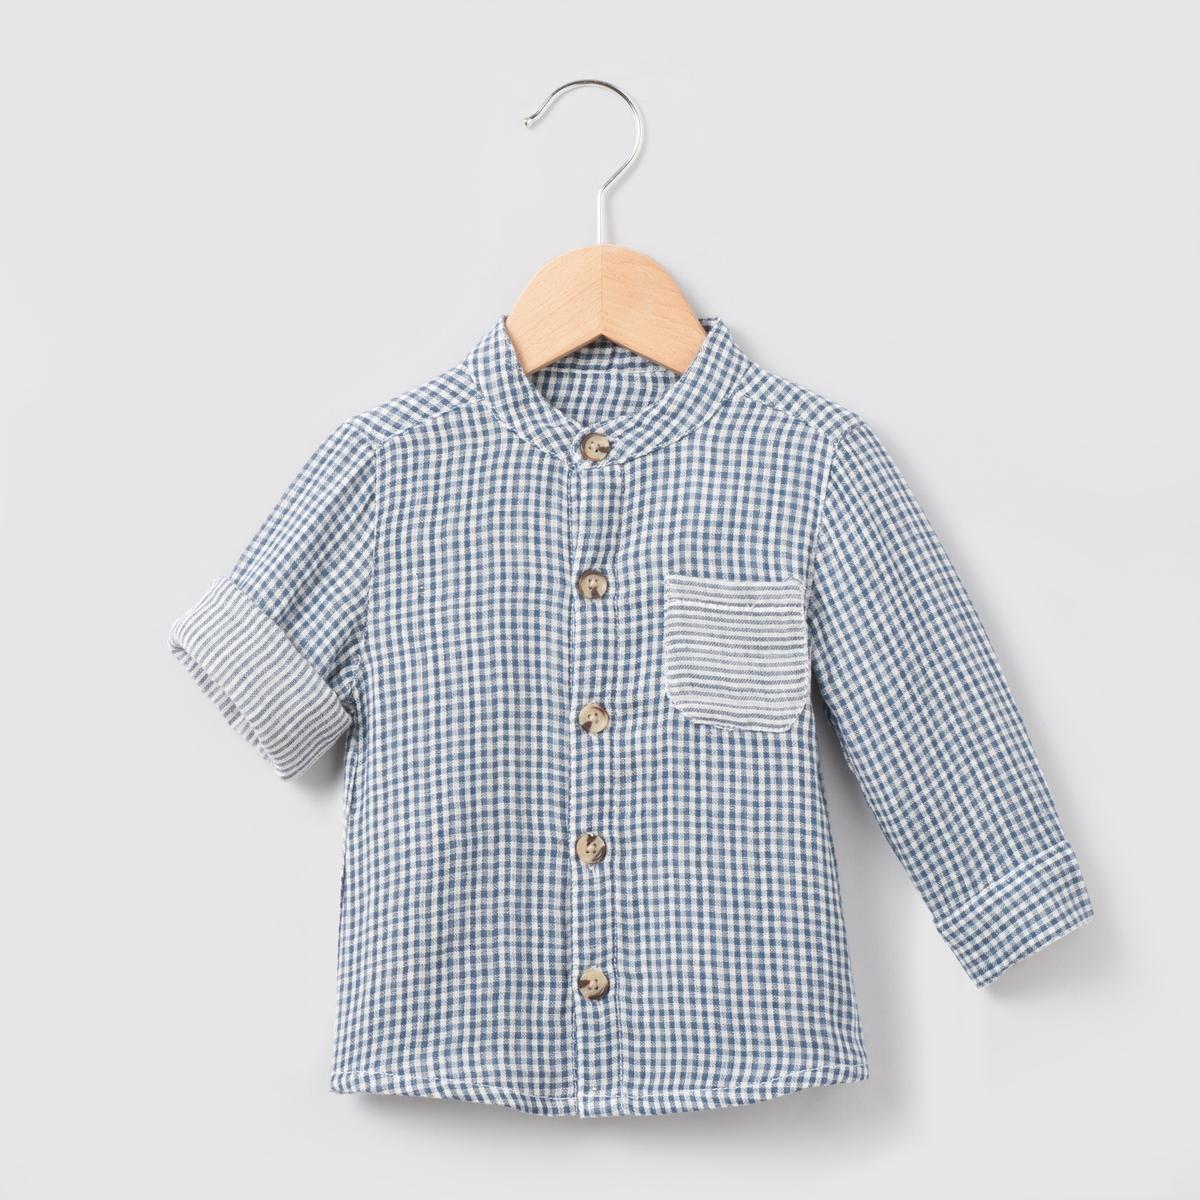 Рубашка в клетку, 1 мес. - 3 года рубашка в клетку dc atura 3 atura black